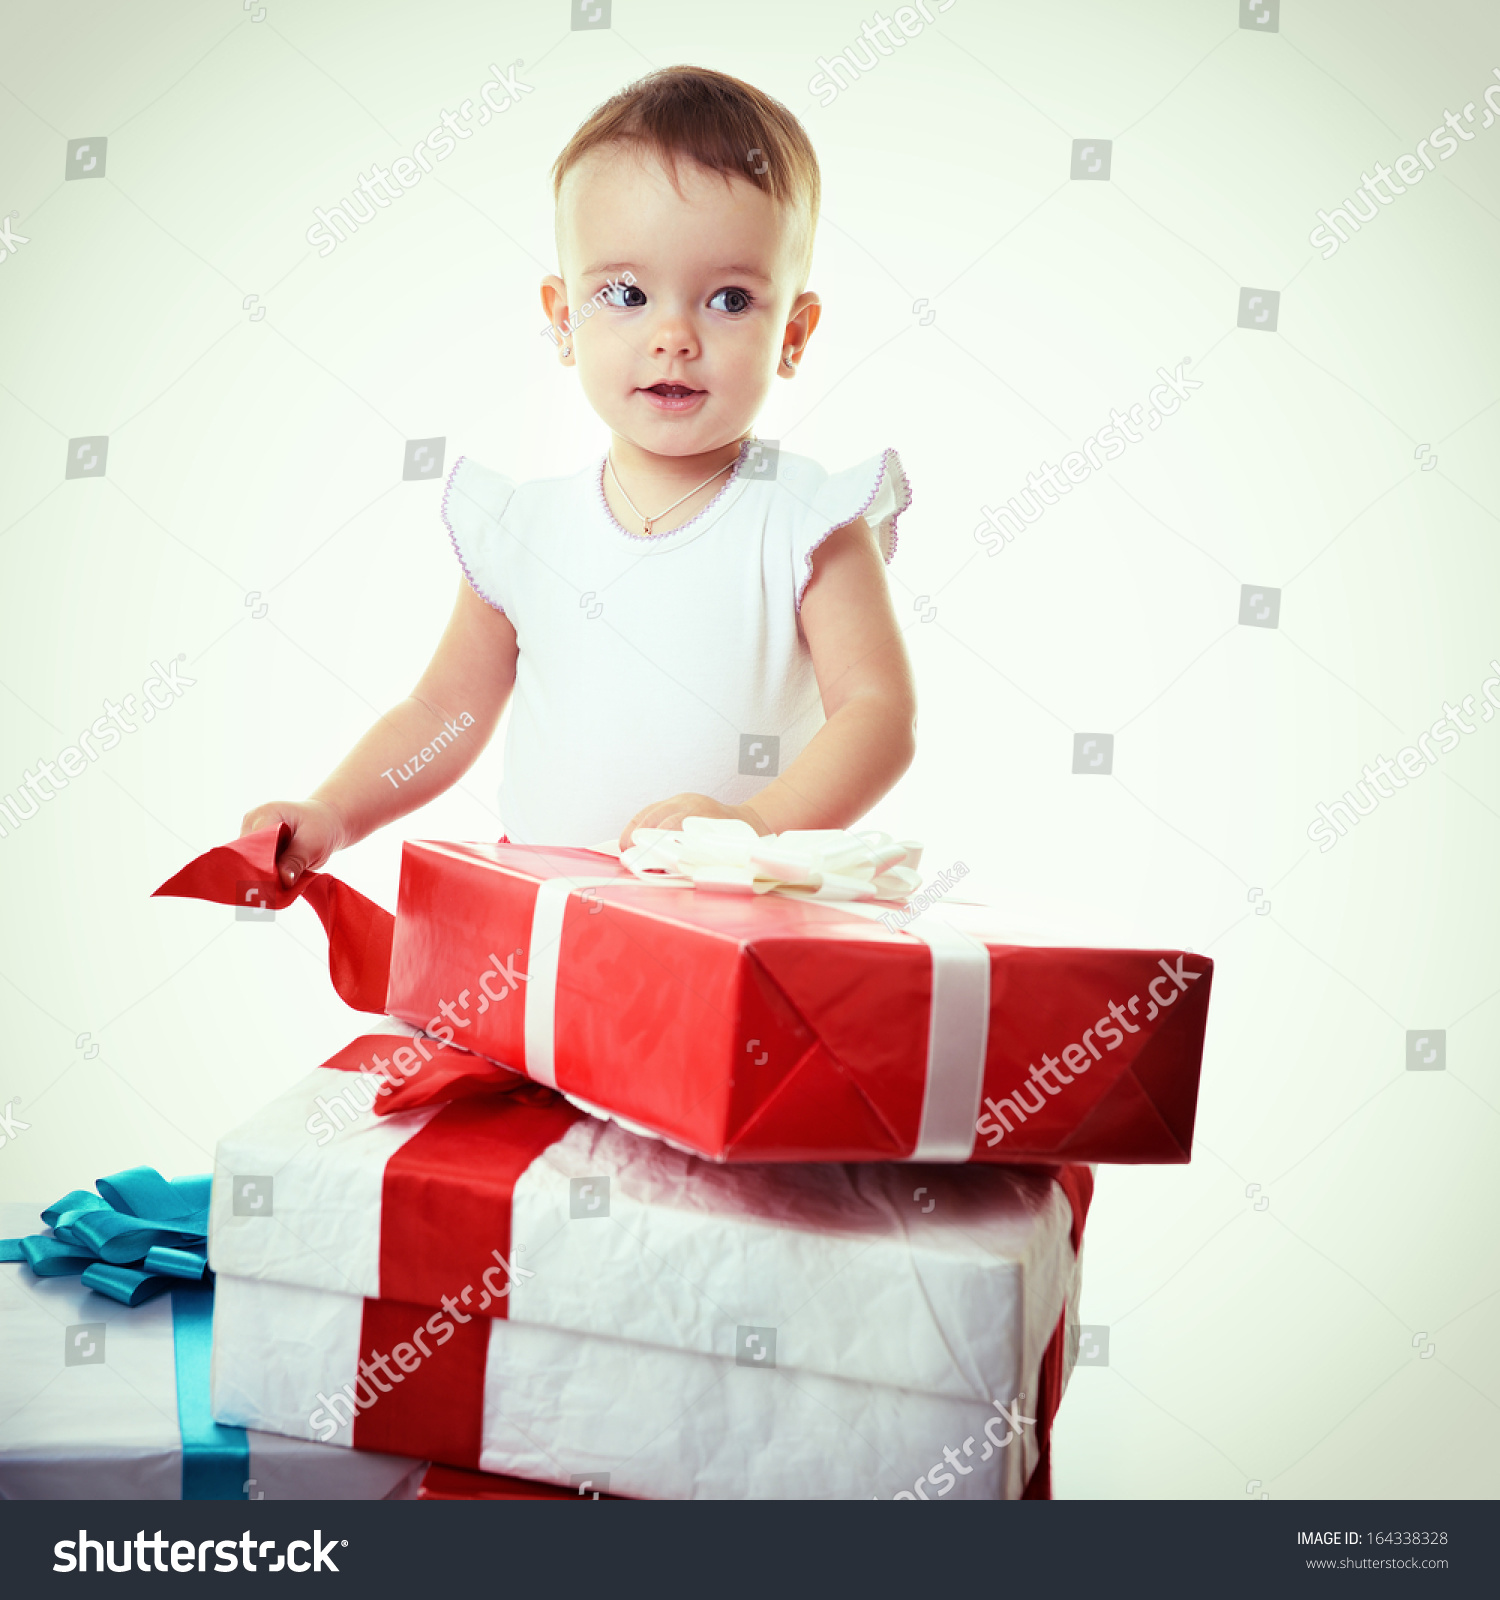 Holidays Baby Girl Opening Box Presents Stock Photo & Image (Royalty ...